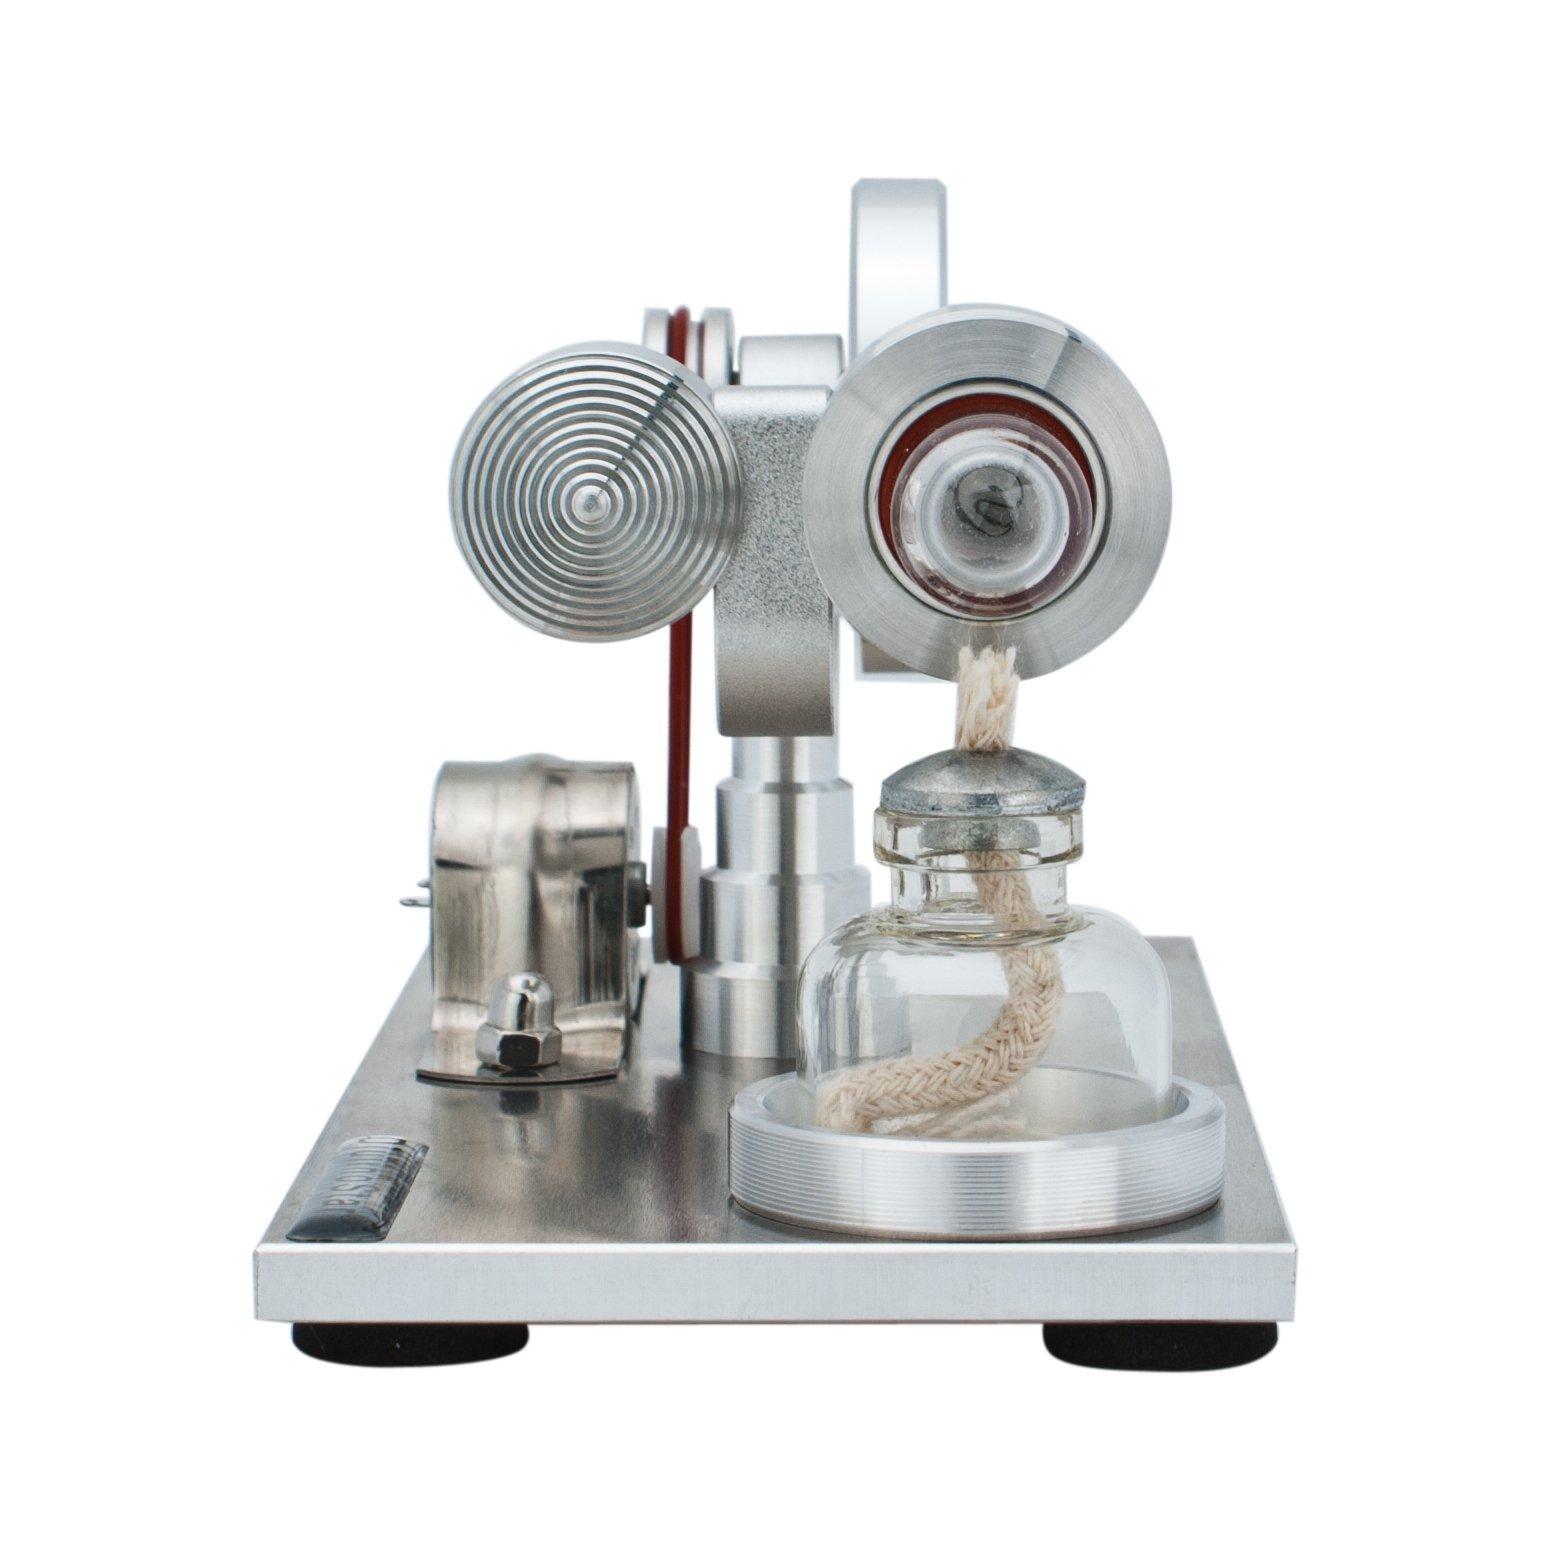 DjuiinoStar Hot Air Stirling Engine, Solid Metal Construction, Electricity Generator(Assembled), My First Stirling Engine by DjuiinoStar (Image #5)